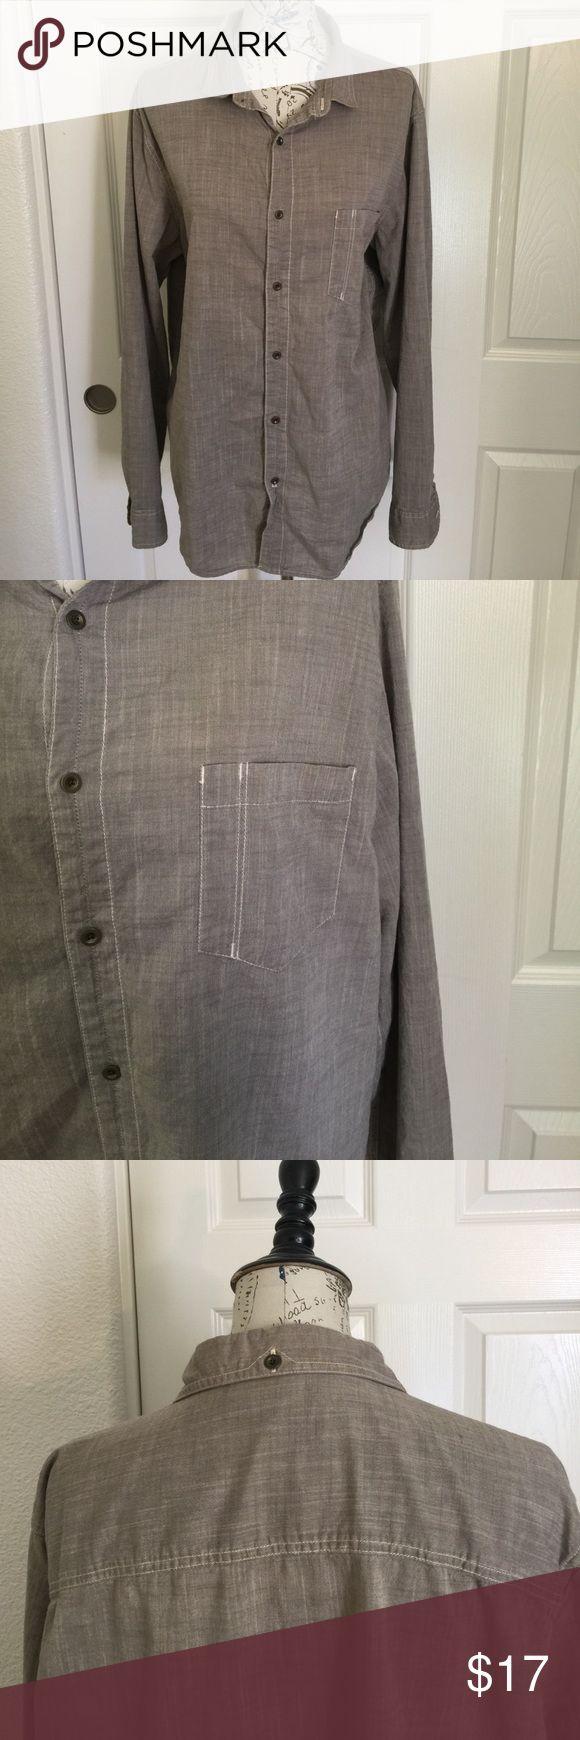 William Rast Long Sleeve Shirt William Rast Long Sleeve Shirt size XXL William Rast Shirts Casual Button Down Shirts